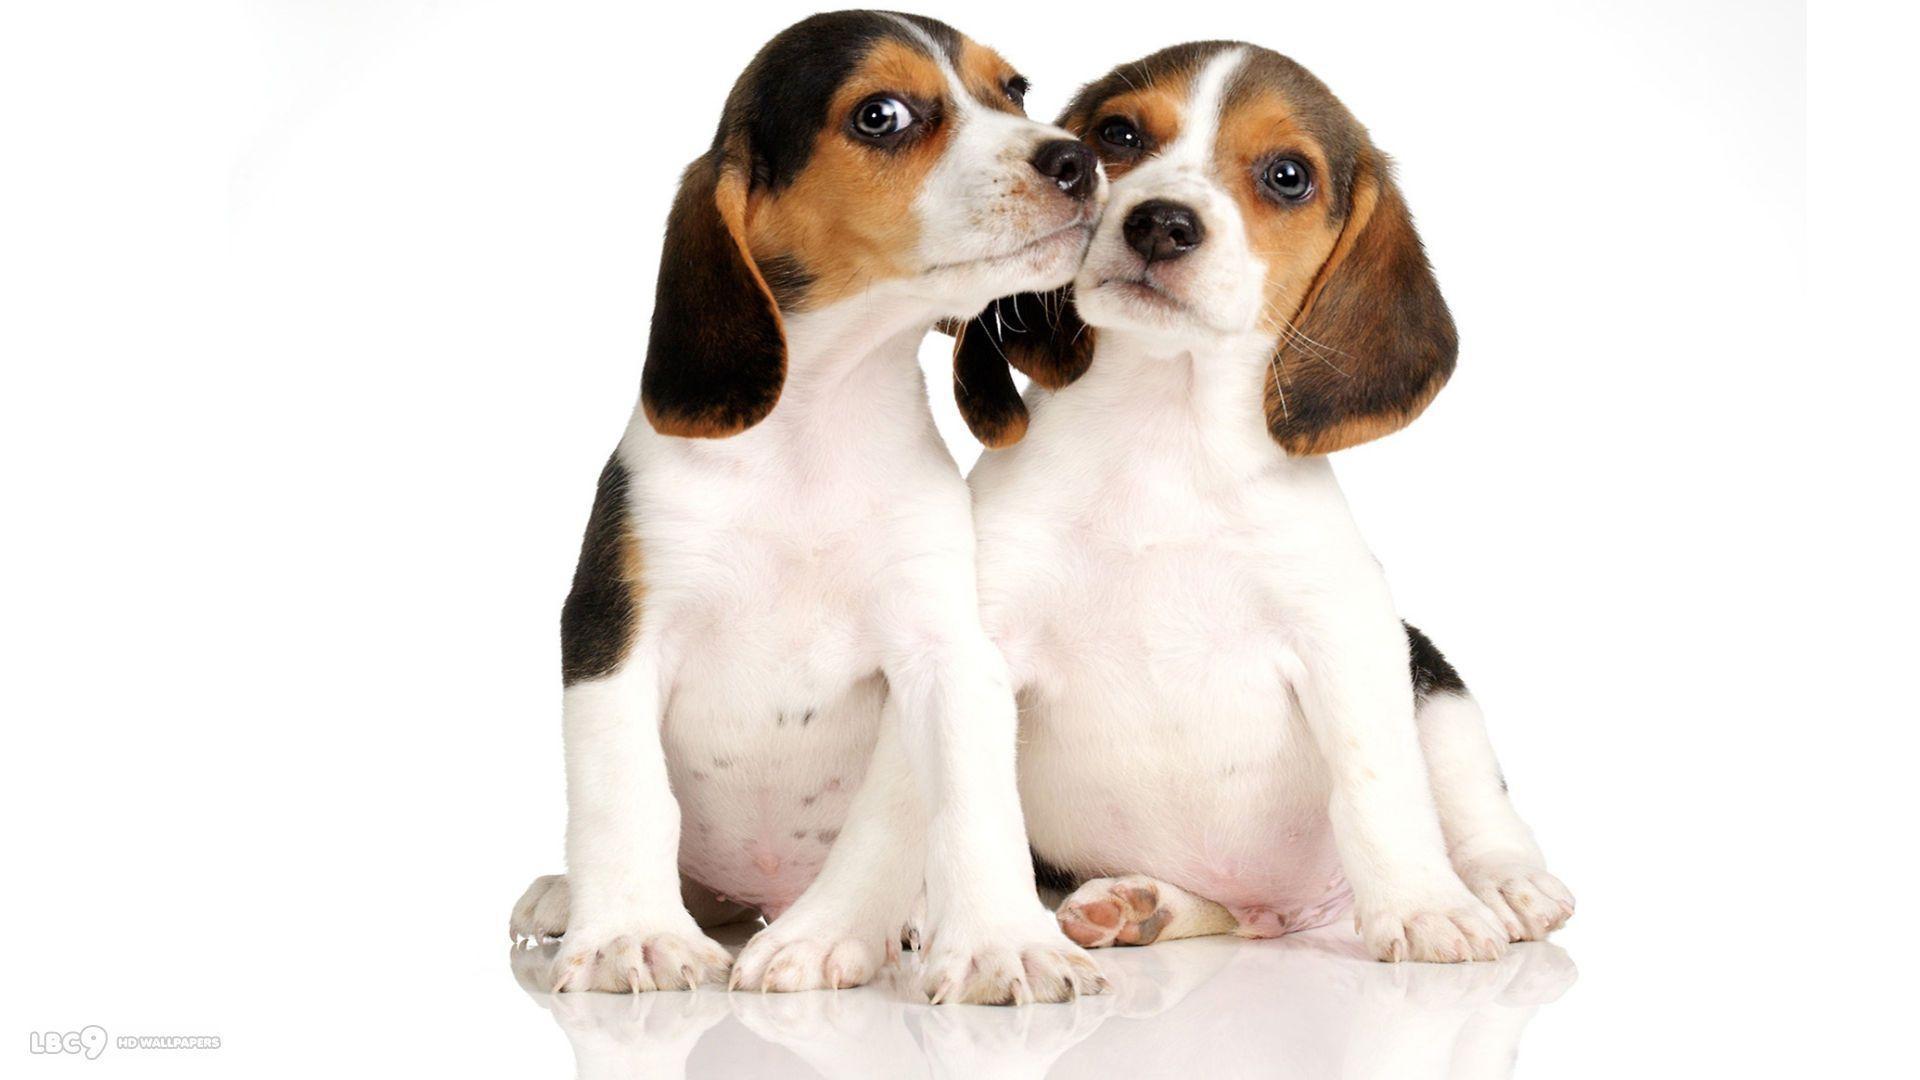 Cute Beagle Puppy Wallpaper Beagle Wallpapers Wallpaper Cave